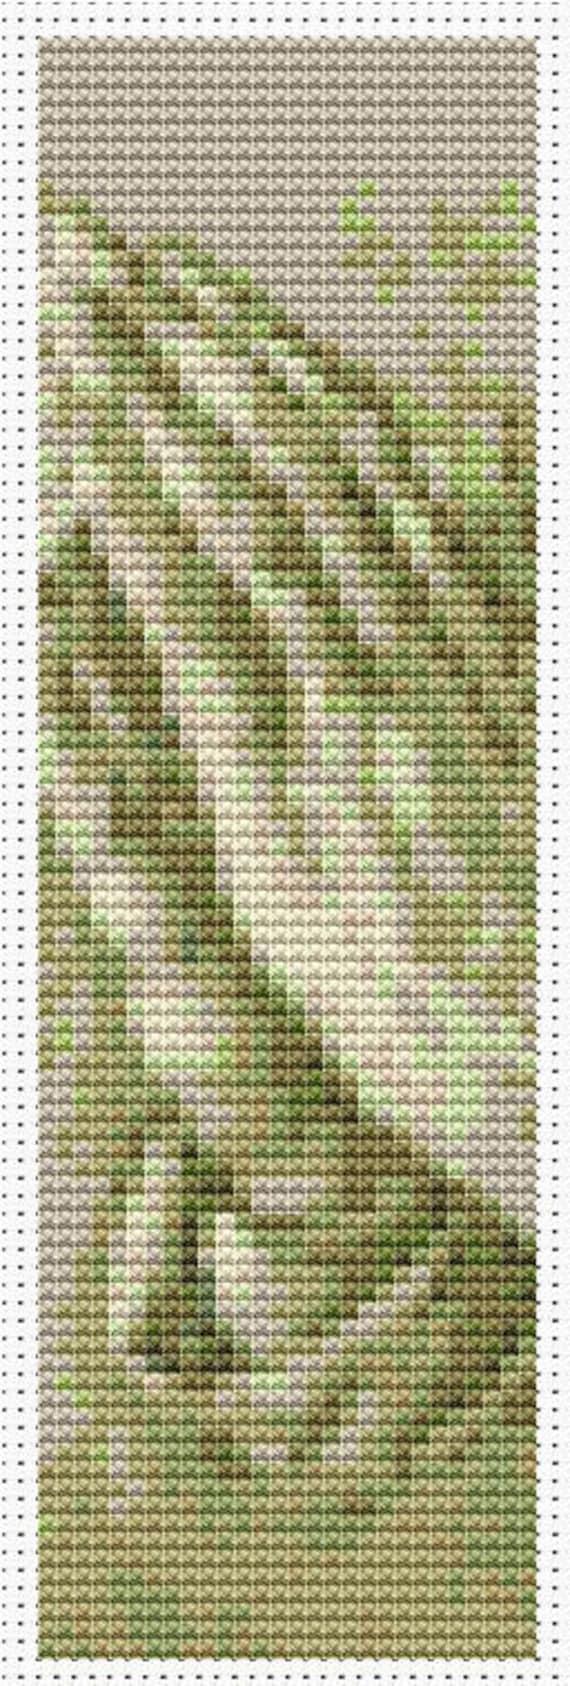 Praying Hands Bookmark Cross Stitch Kit Embroidery Kit